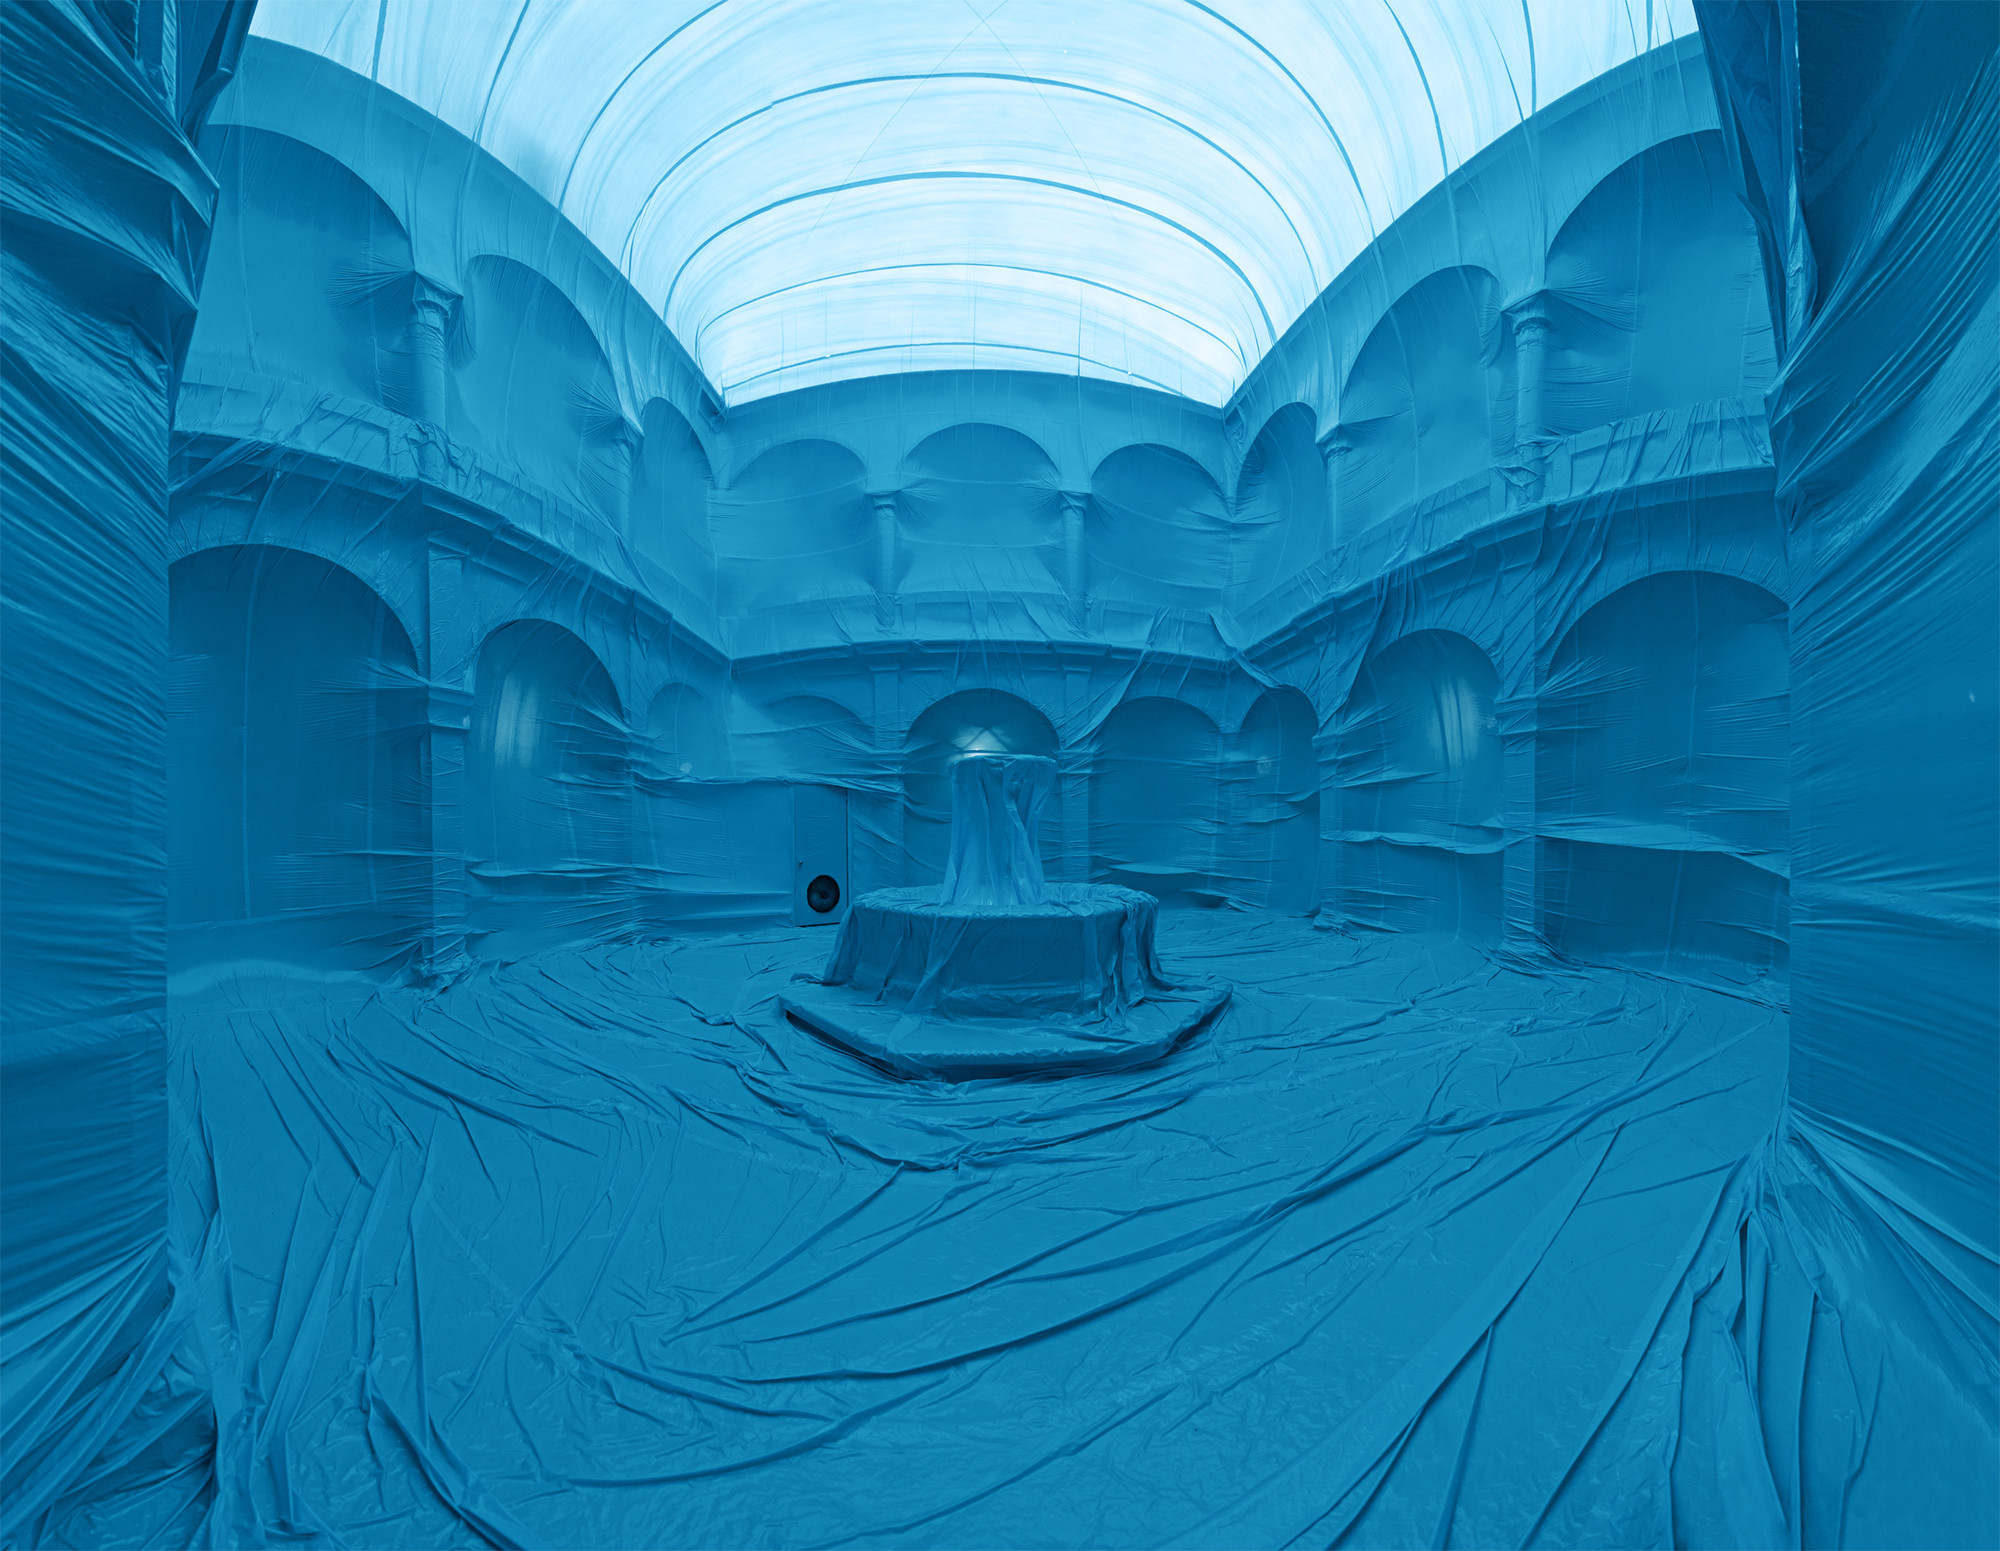 Intervención Urbana: estructuras inflables que se apropian de la arquitectura por Penique productions, El Claustro. Image Cortesia de Peniques productions